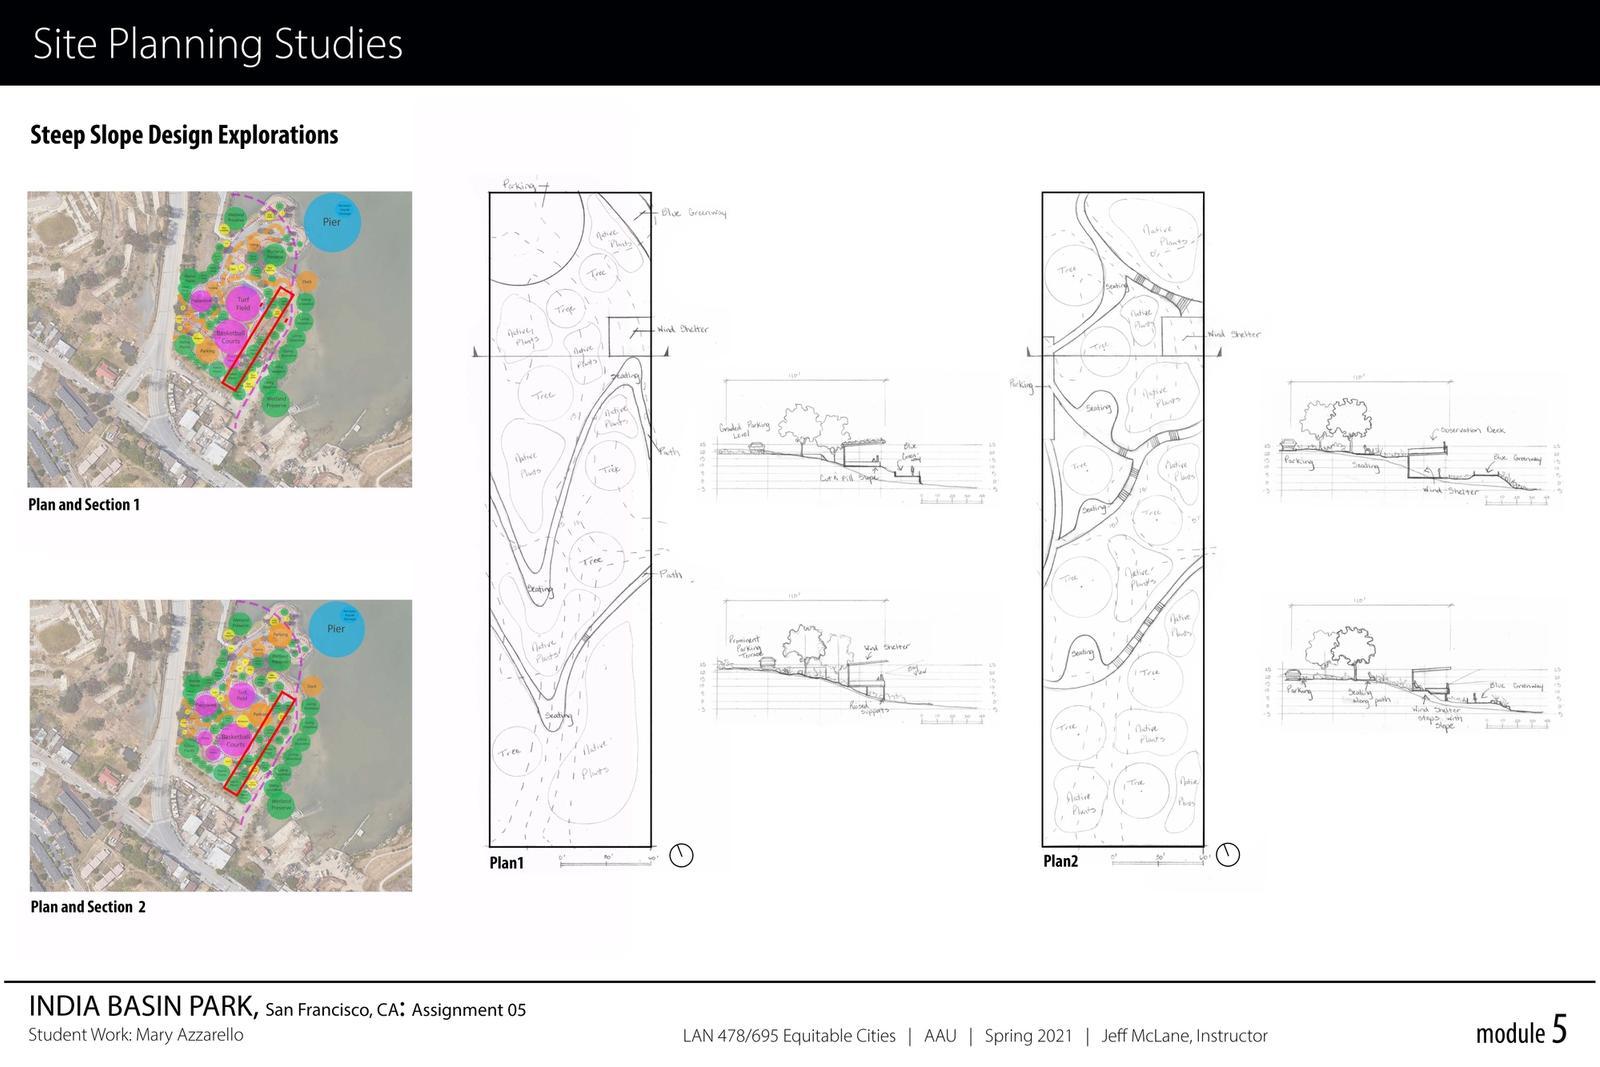 India Basin Park, San Francisco - Site Planning Studies 2